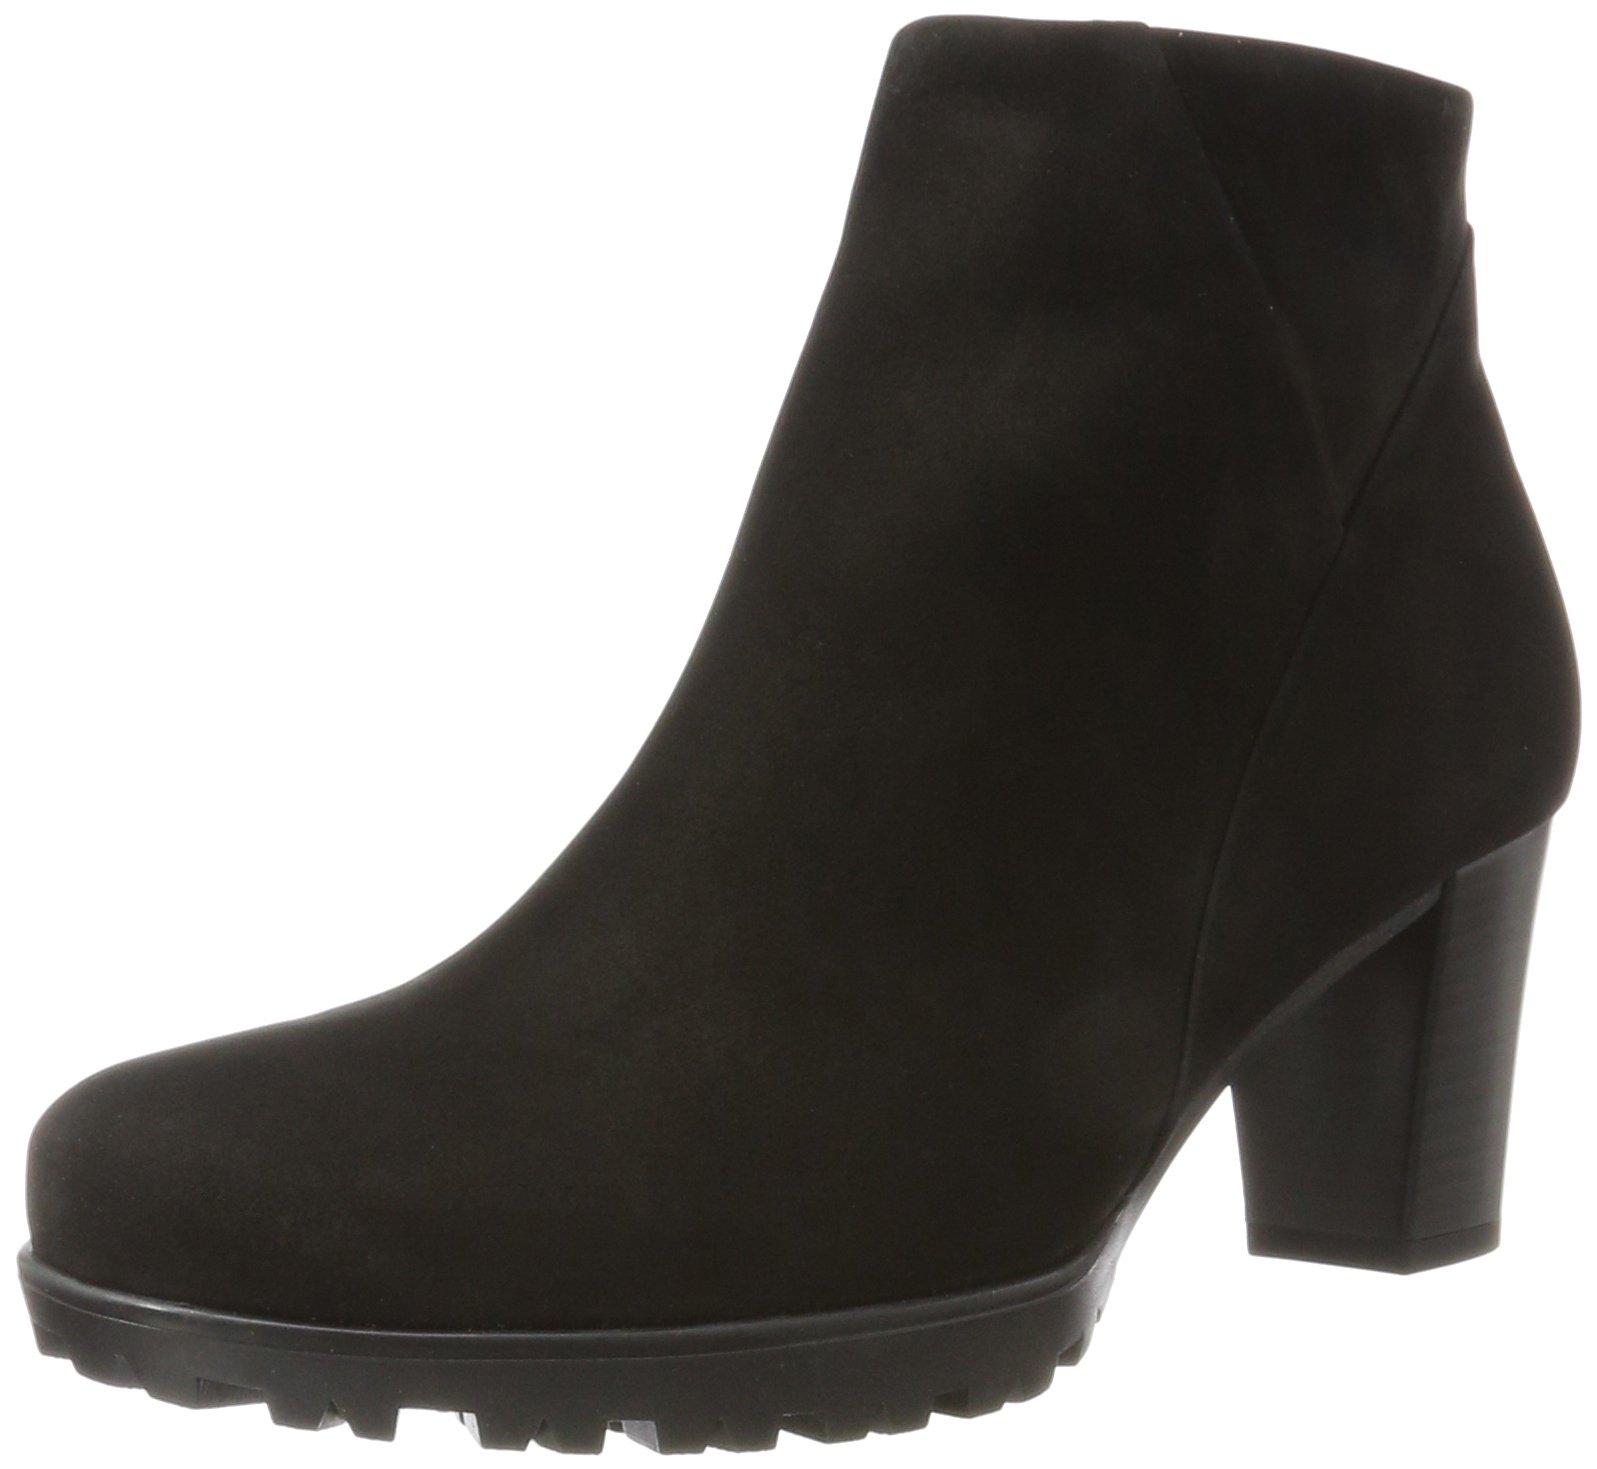 5 FemmeNoir47 Shoes Comfort Eu SportBottes Gabor Schwarz Micro40 mn8N0w